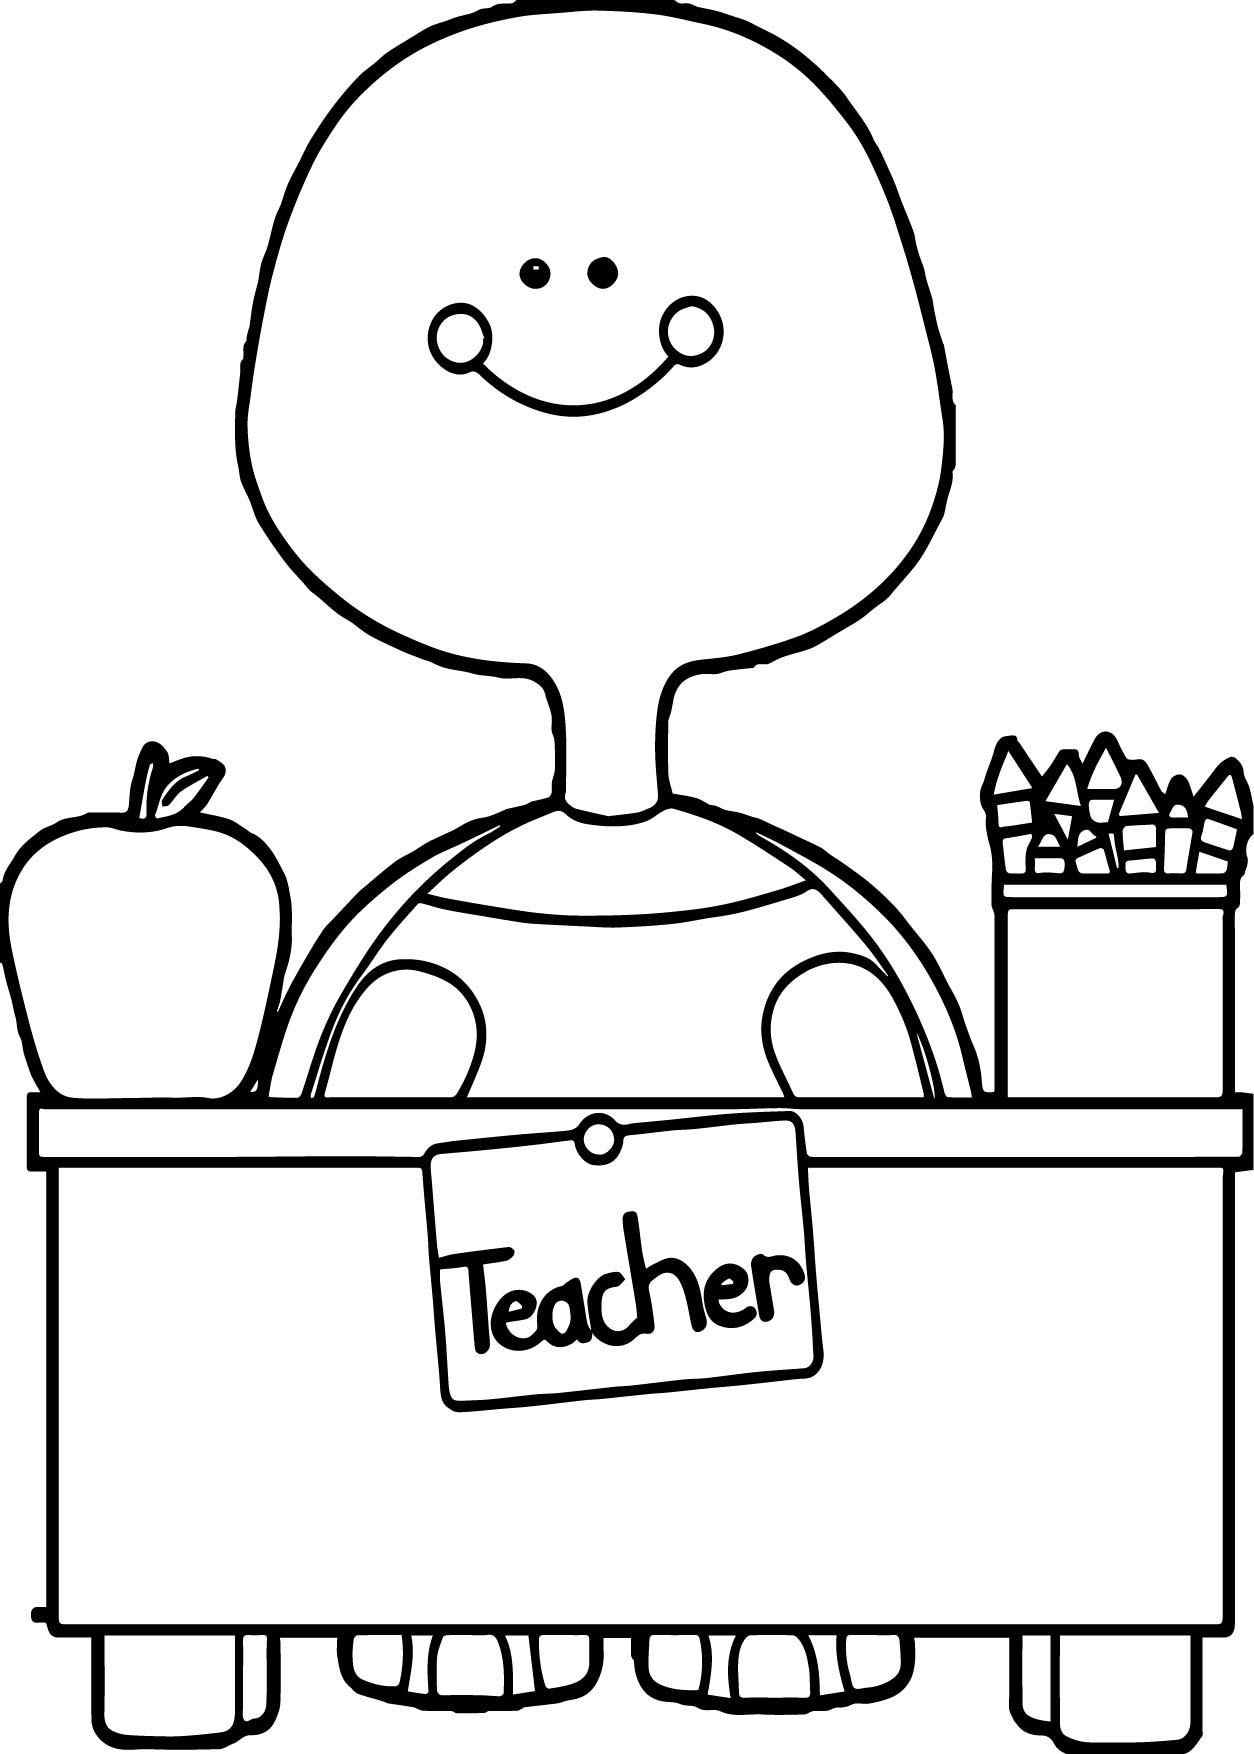 Teacher Apple Coloring Pages : Teacher apple page coloring pages